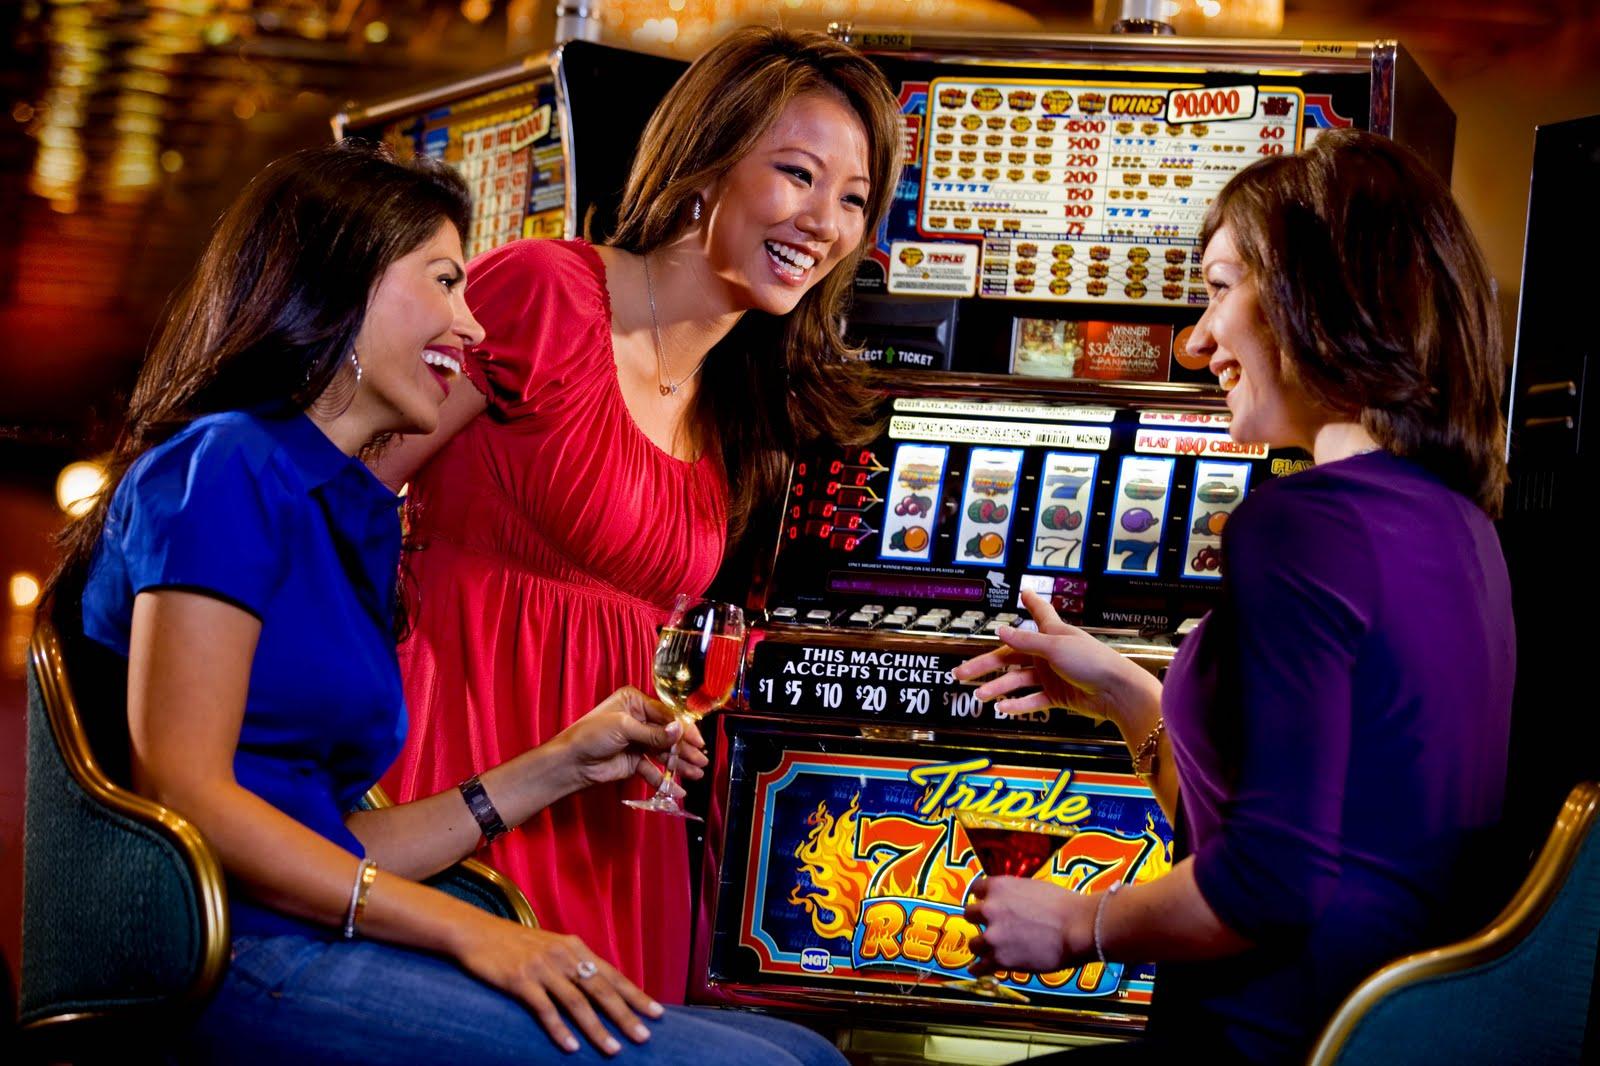 бездепозитный бонус за регистрацию на покер старс на